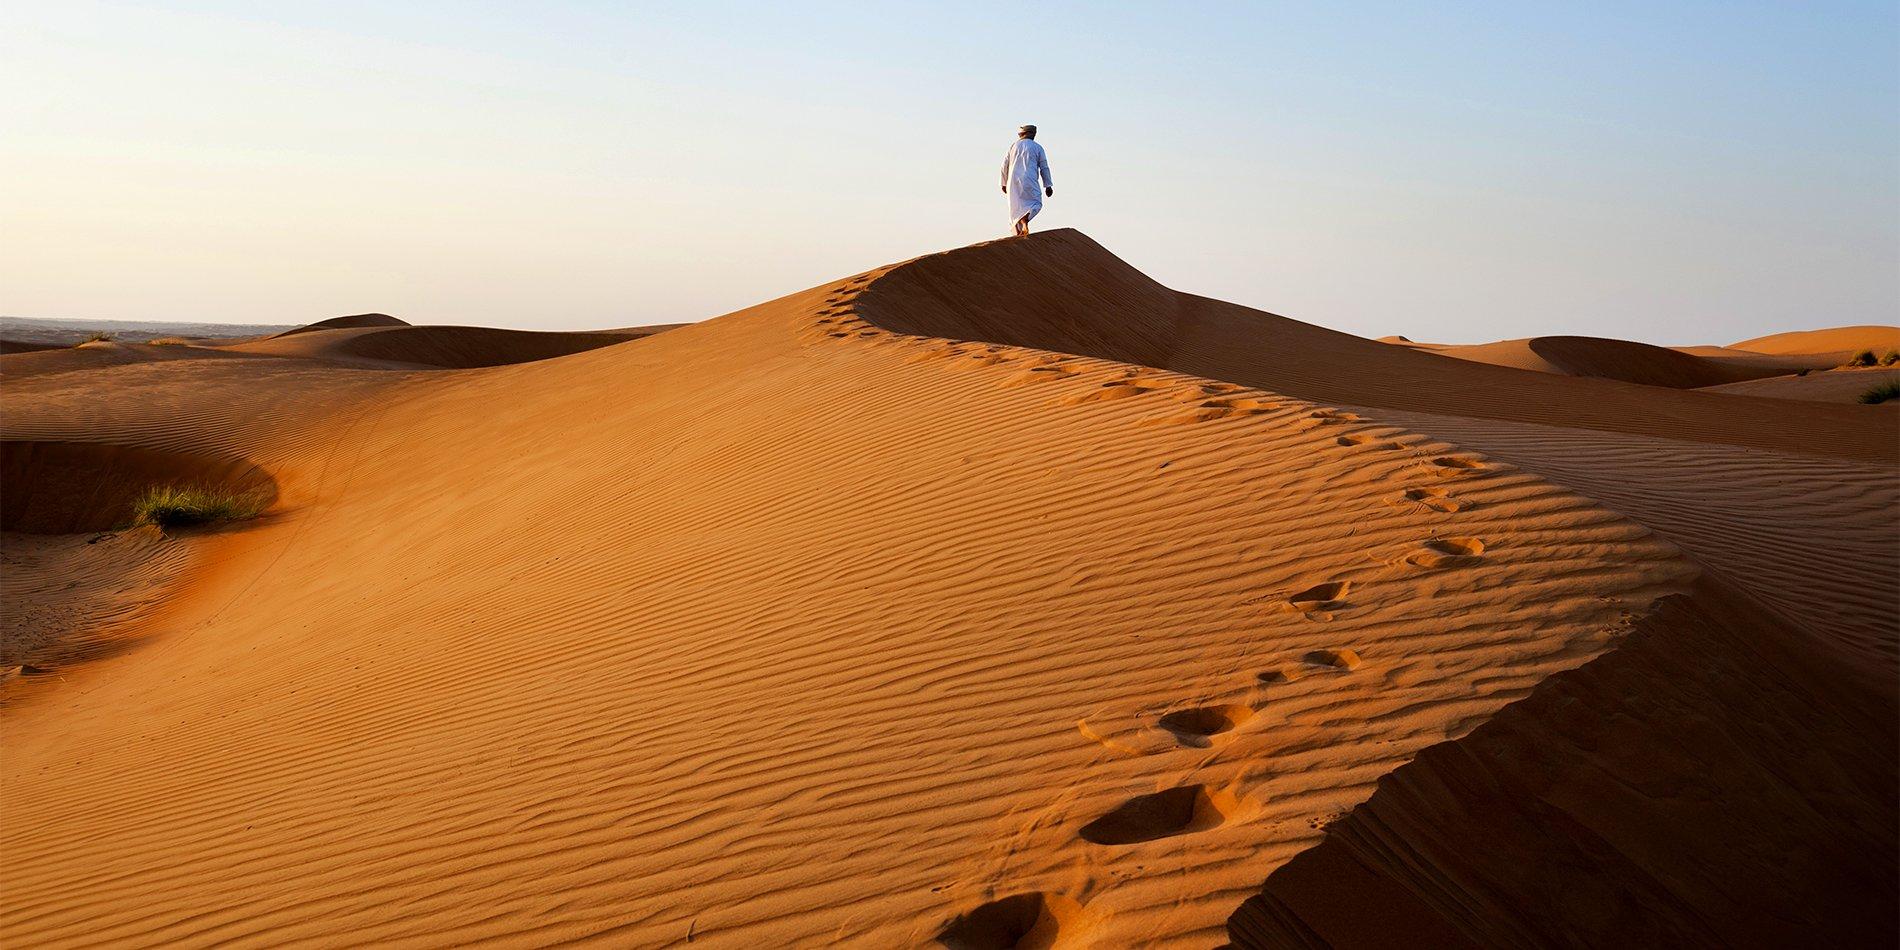 © Sergio Pitamitz / Sultanat d'Oman